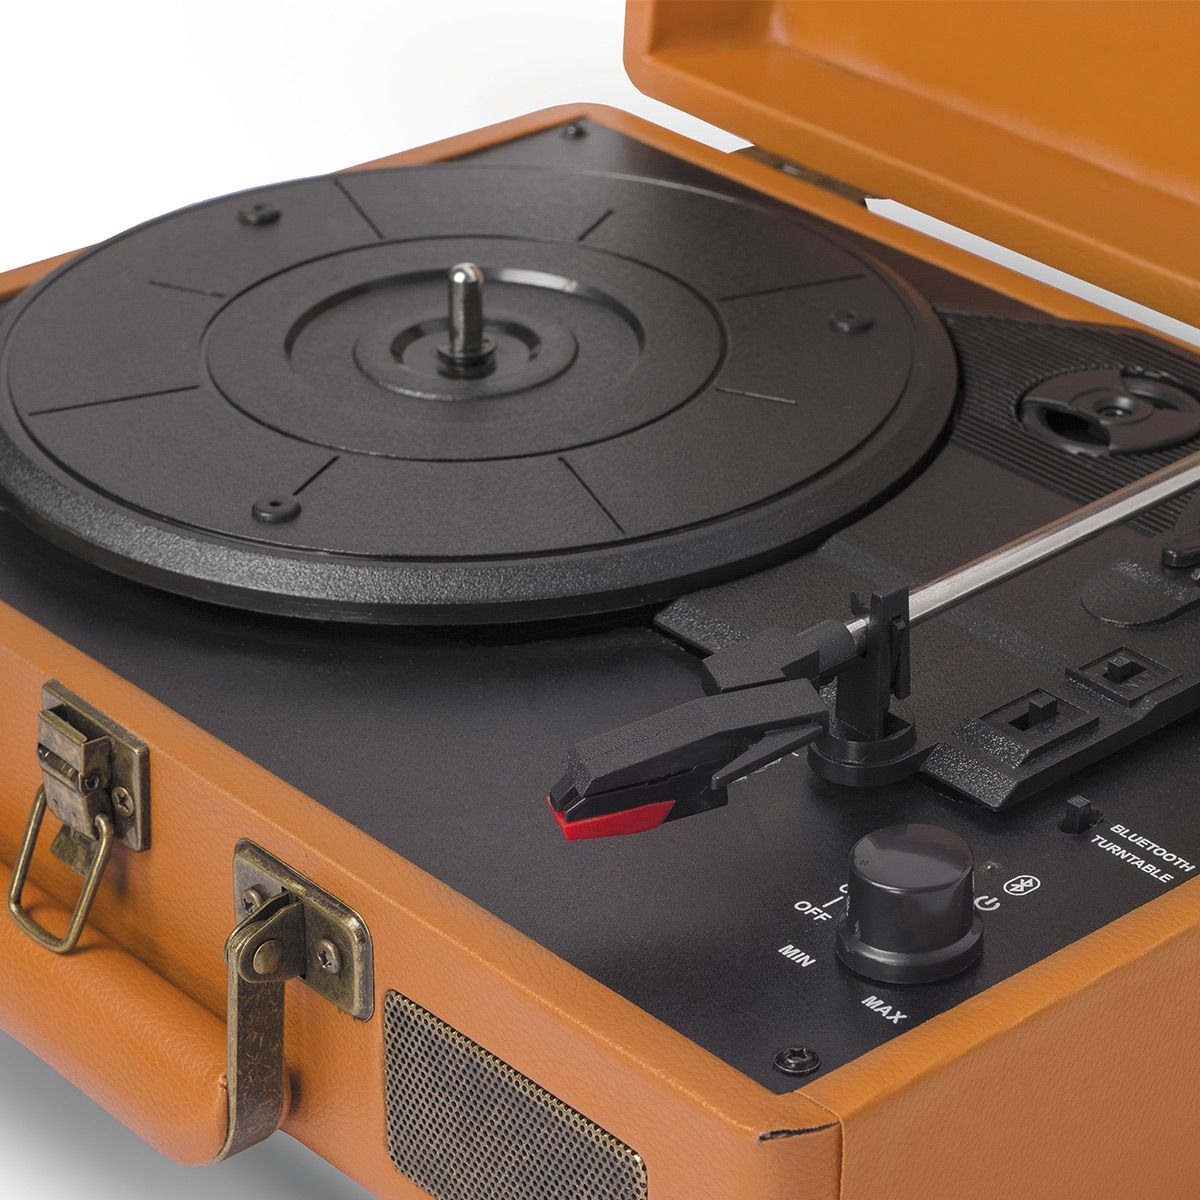 Vitrola Raveo Sonetto Caramelo - Toca Discos, BT E USB